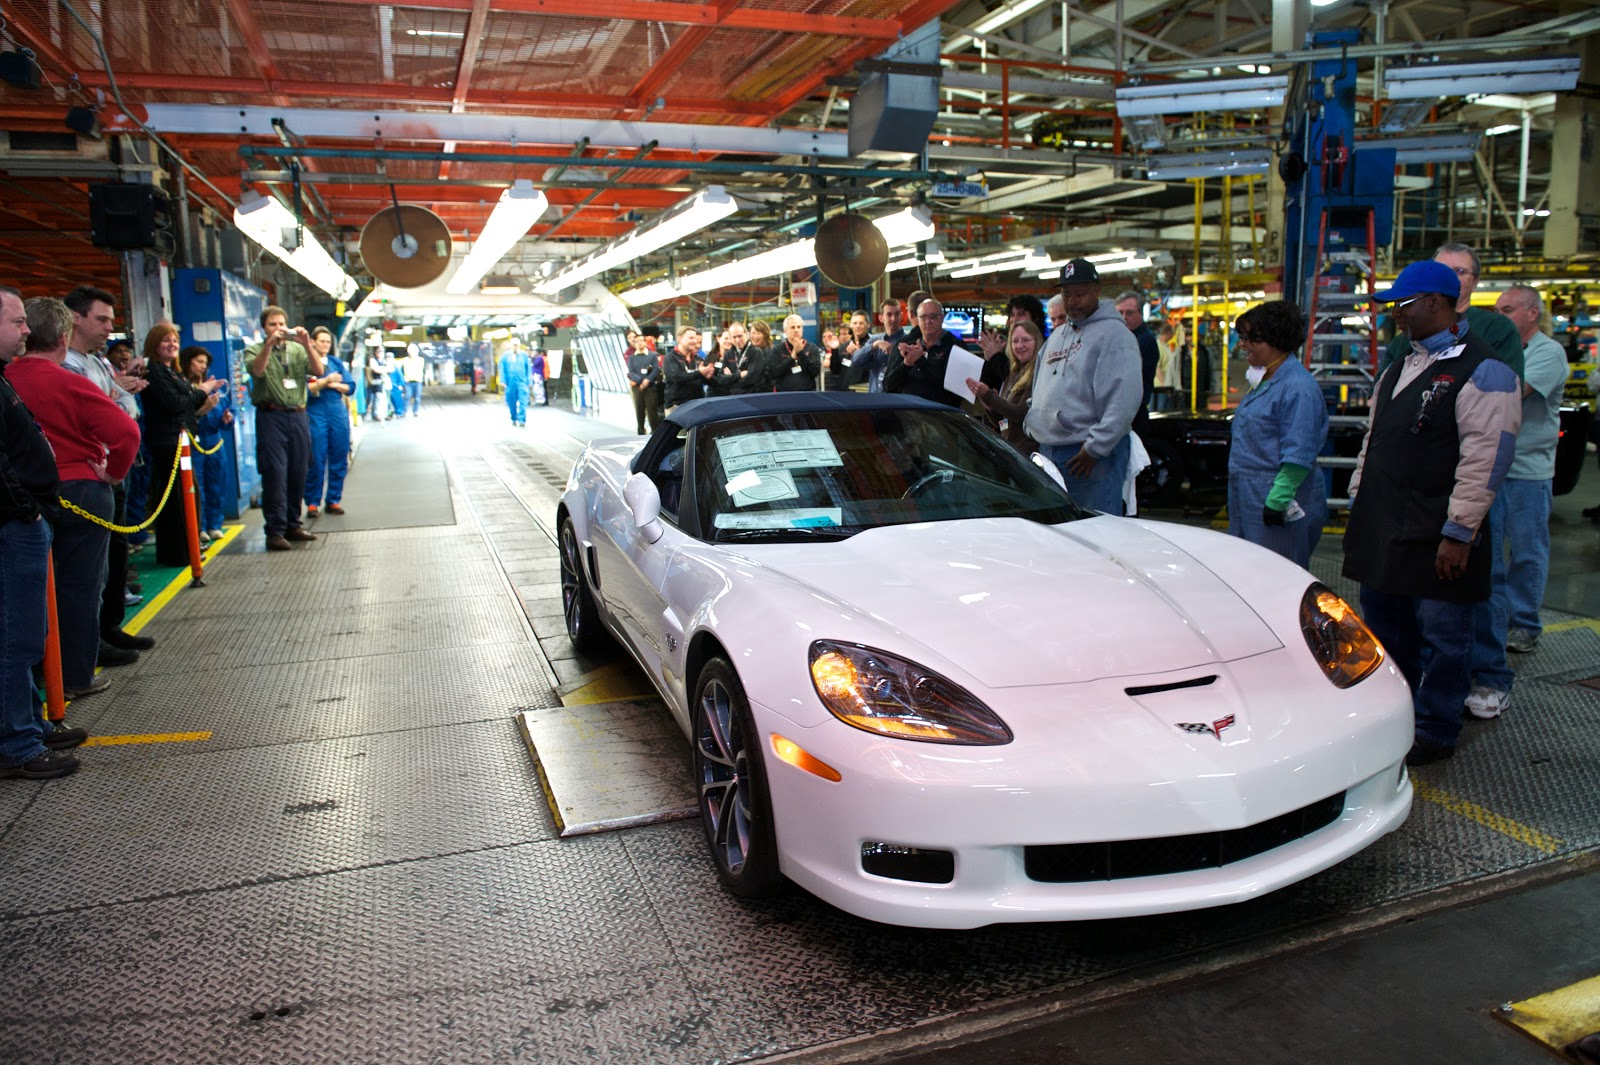 Last c6 corvette rolls off gm bowling green assembly plant line